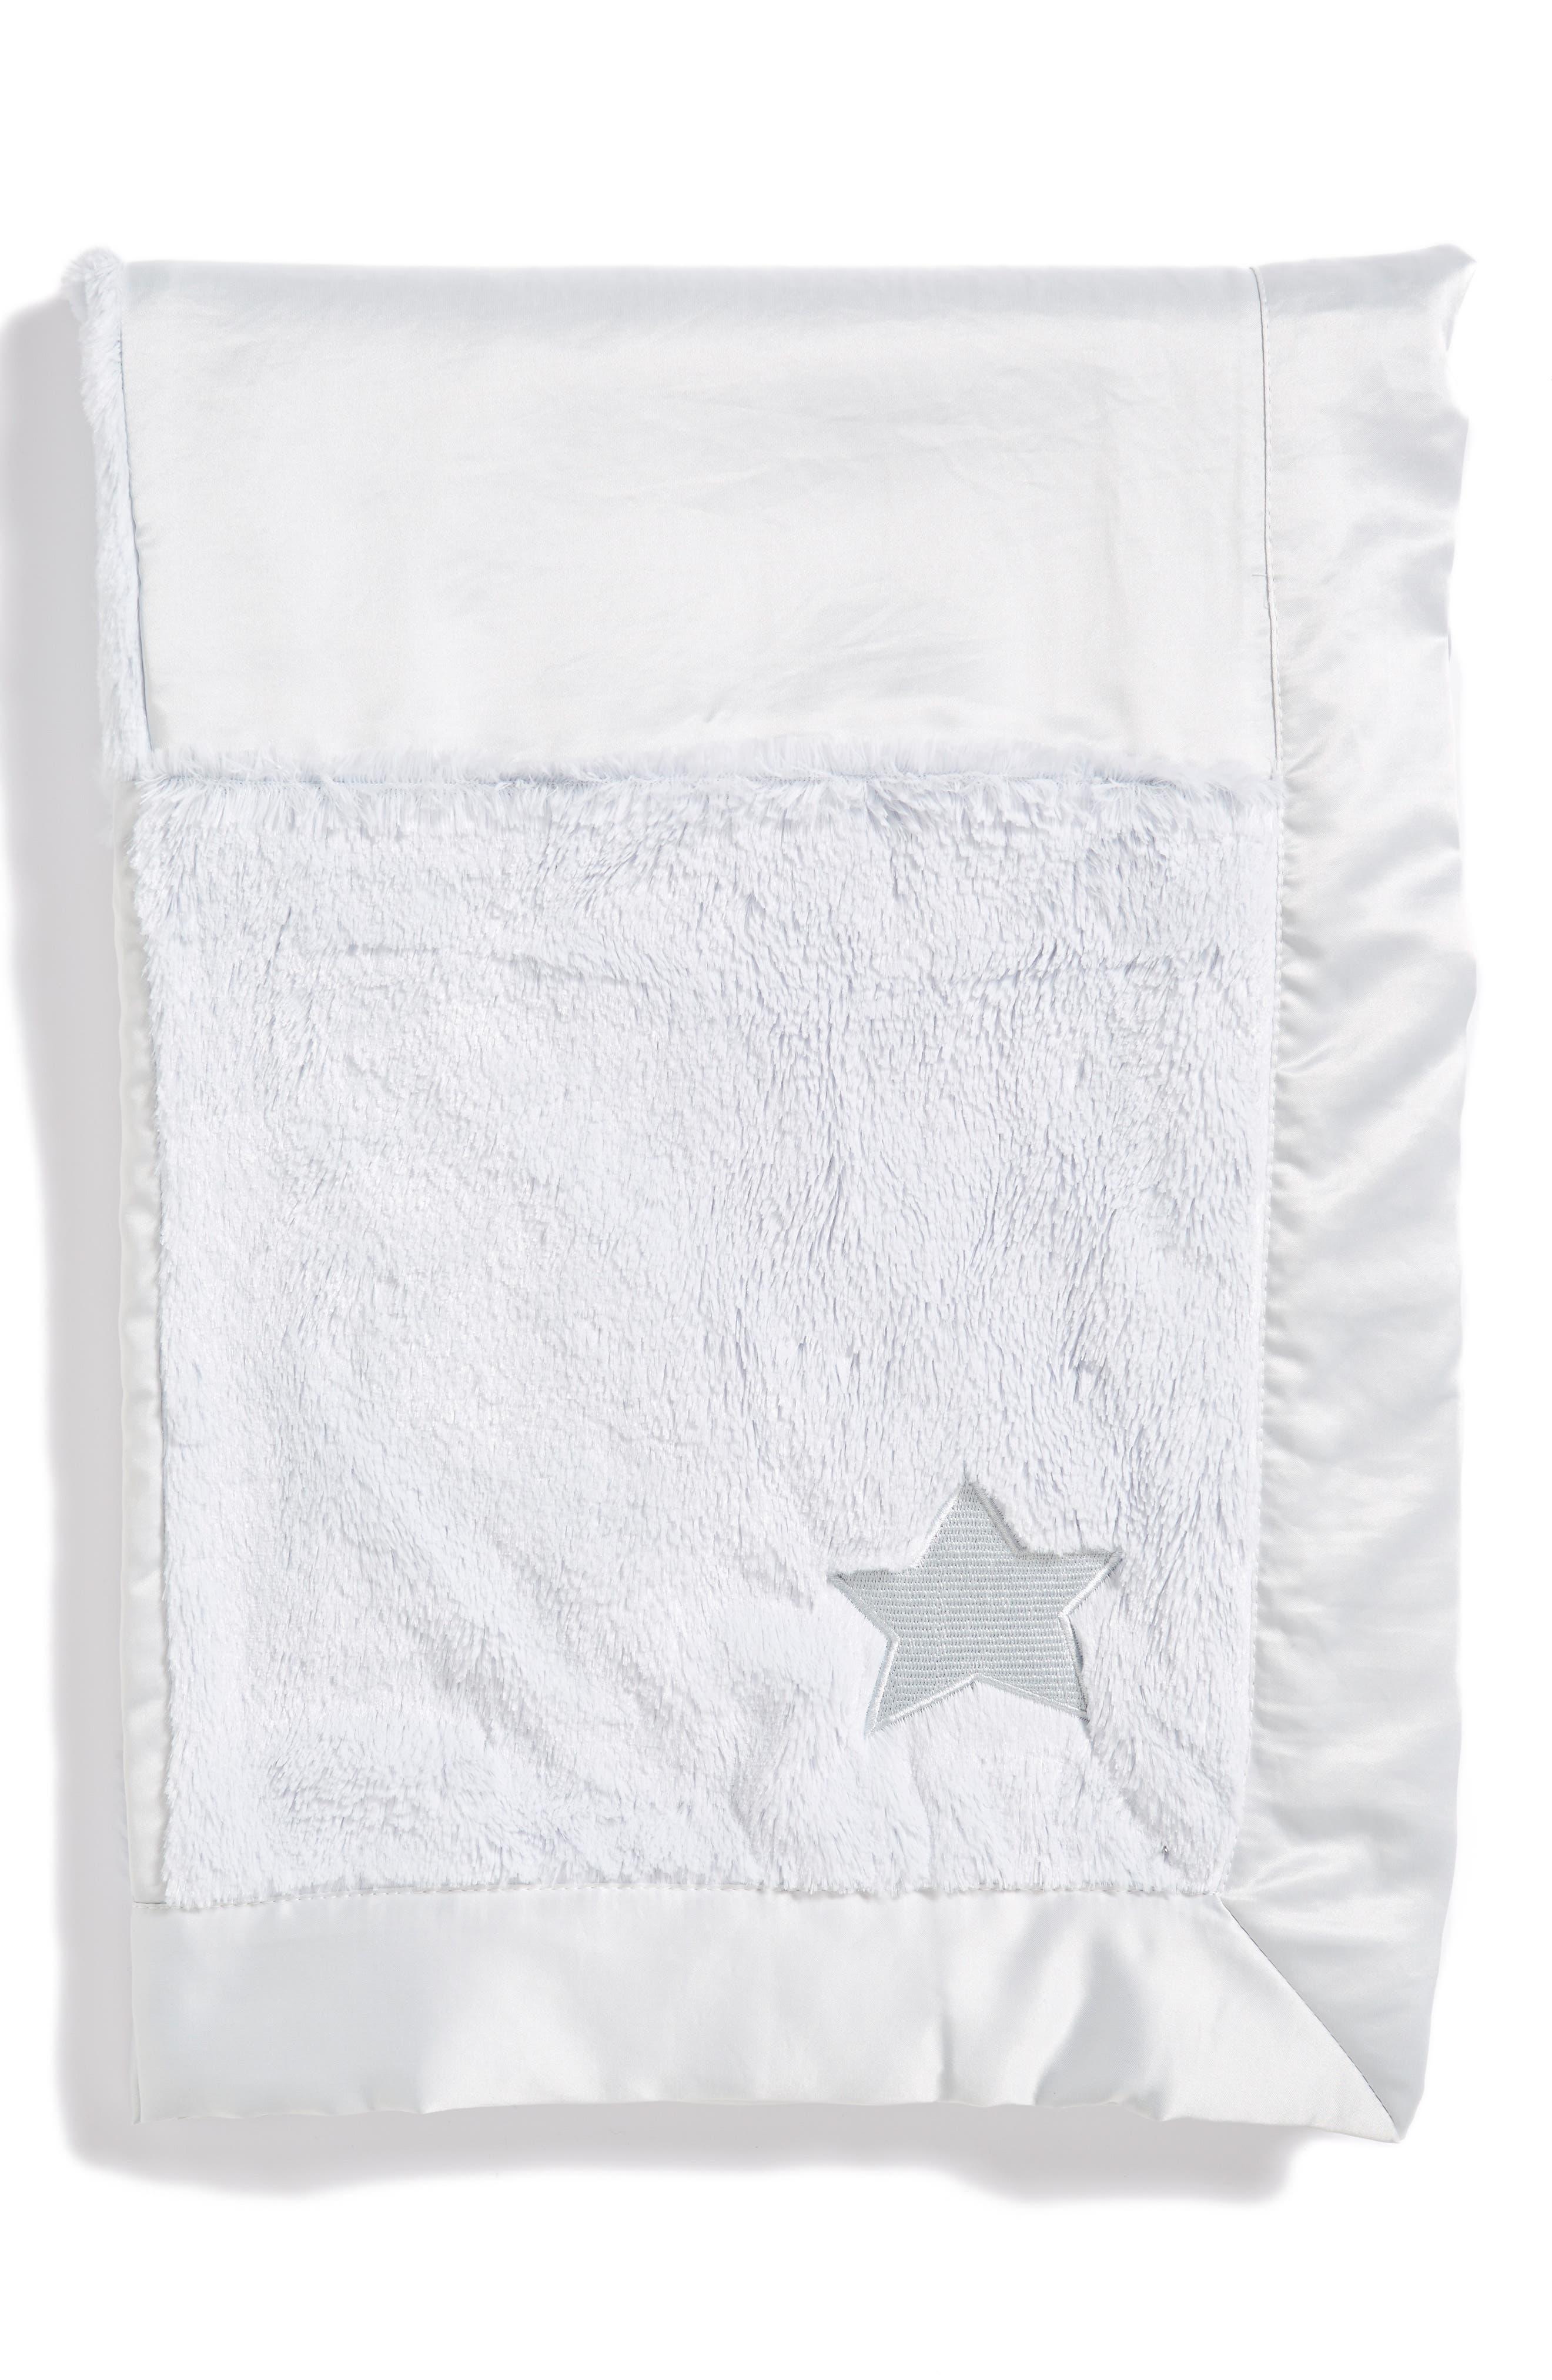 'Cuddle' Patchwork Receiving Blanket,                             Alternate thumbnail 2, color,                             400